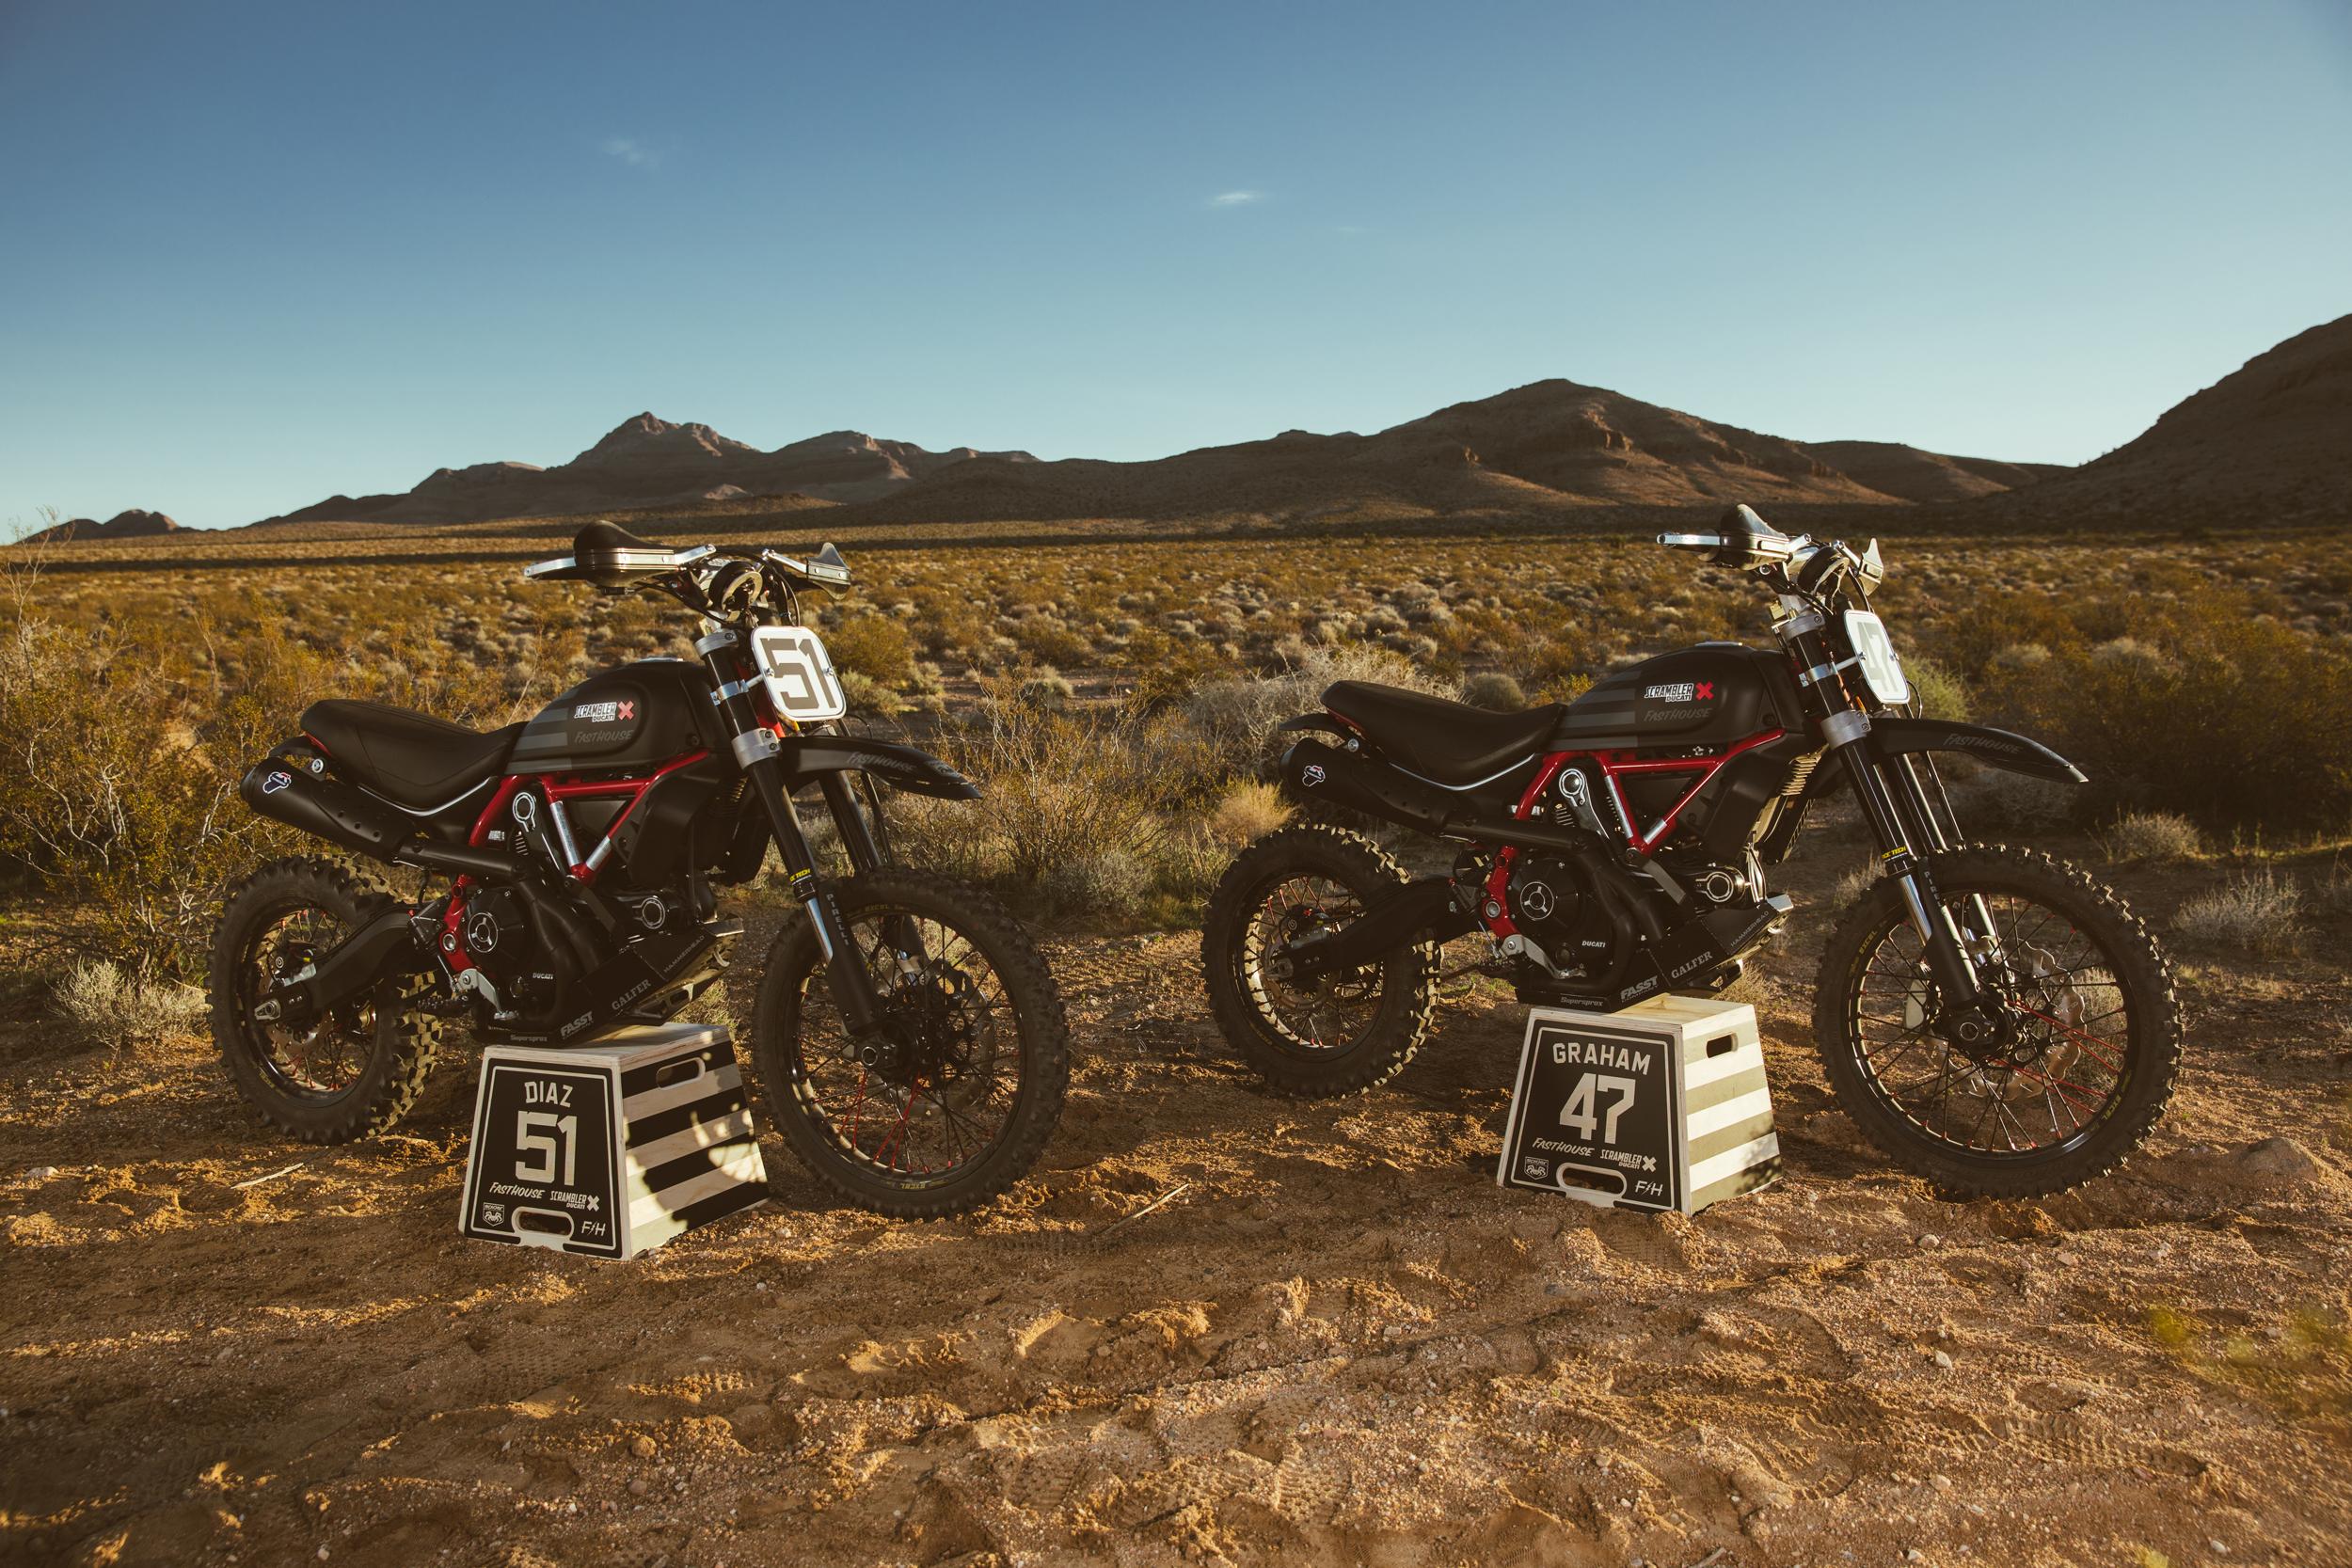 Scrambler Ducati Desert Sled Dominates Inaugural Mint 400 Hooligan Class [1]